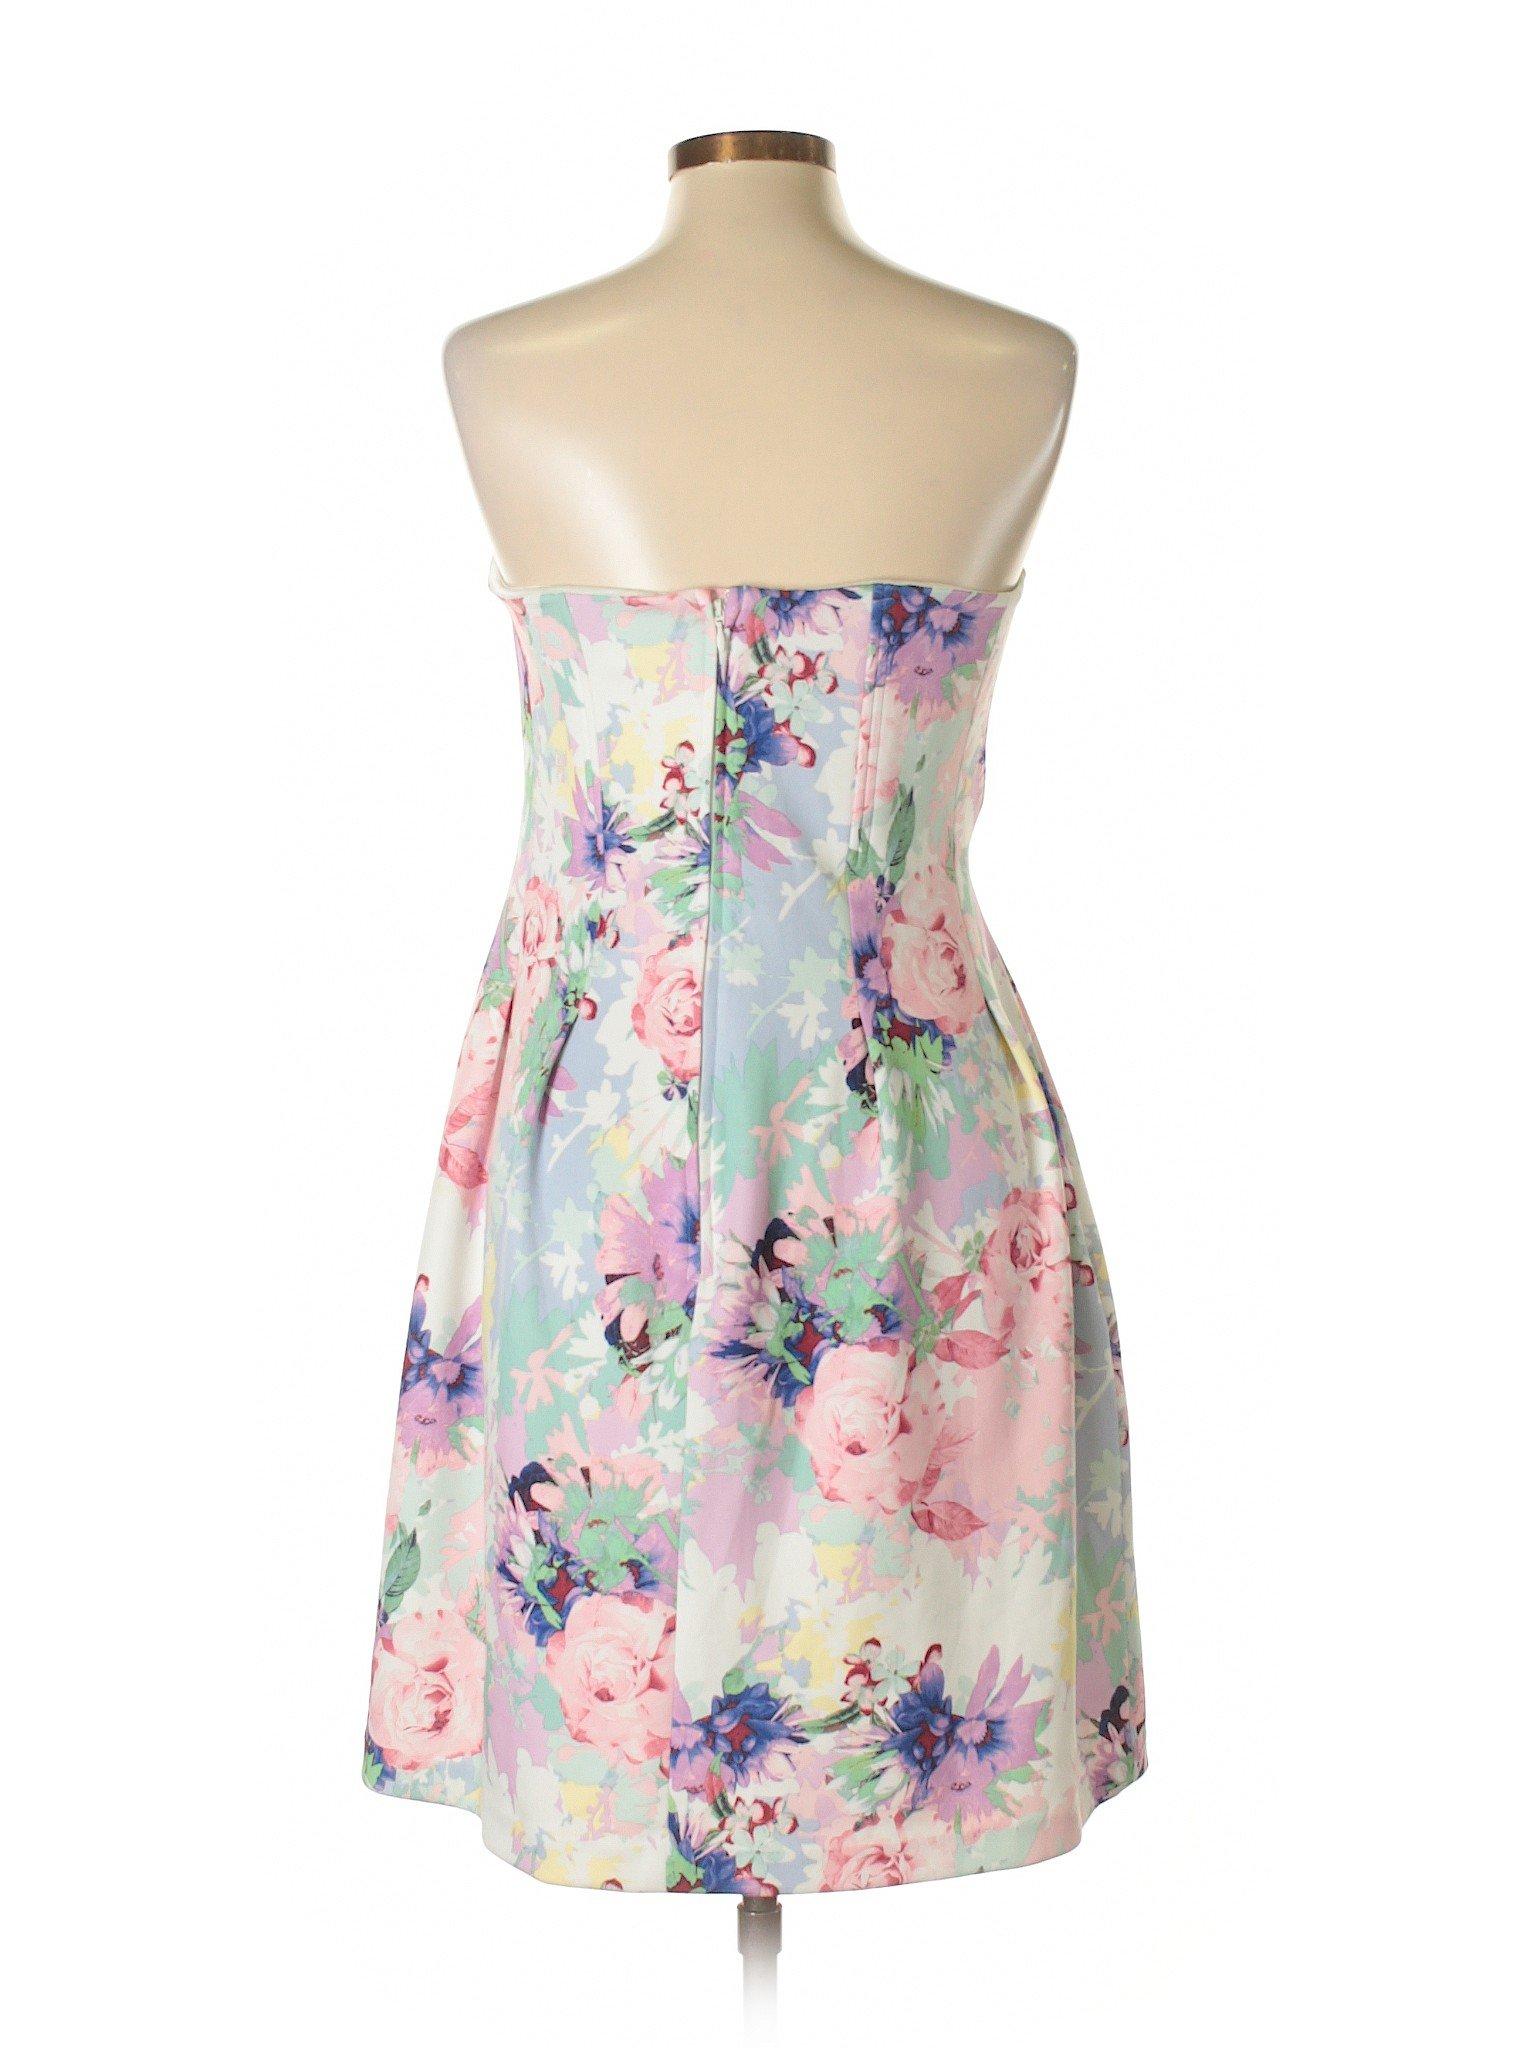 Company York Casual winter Boutique Dress amp; New wqROI8